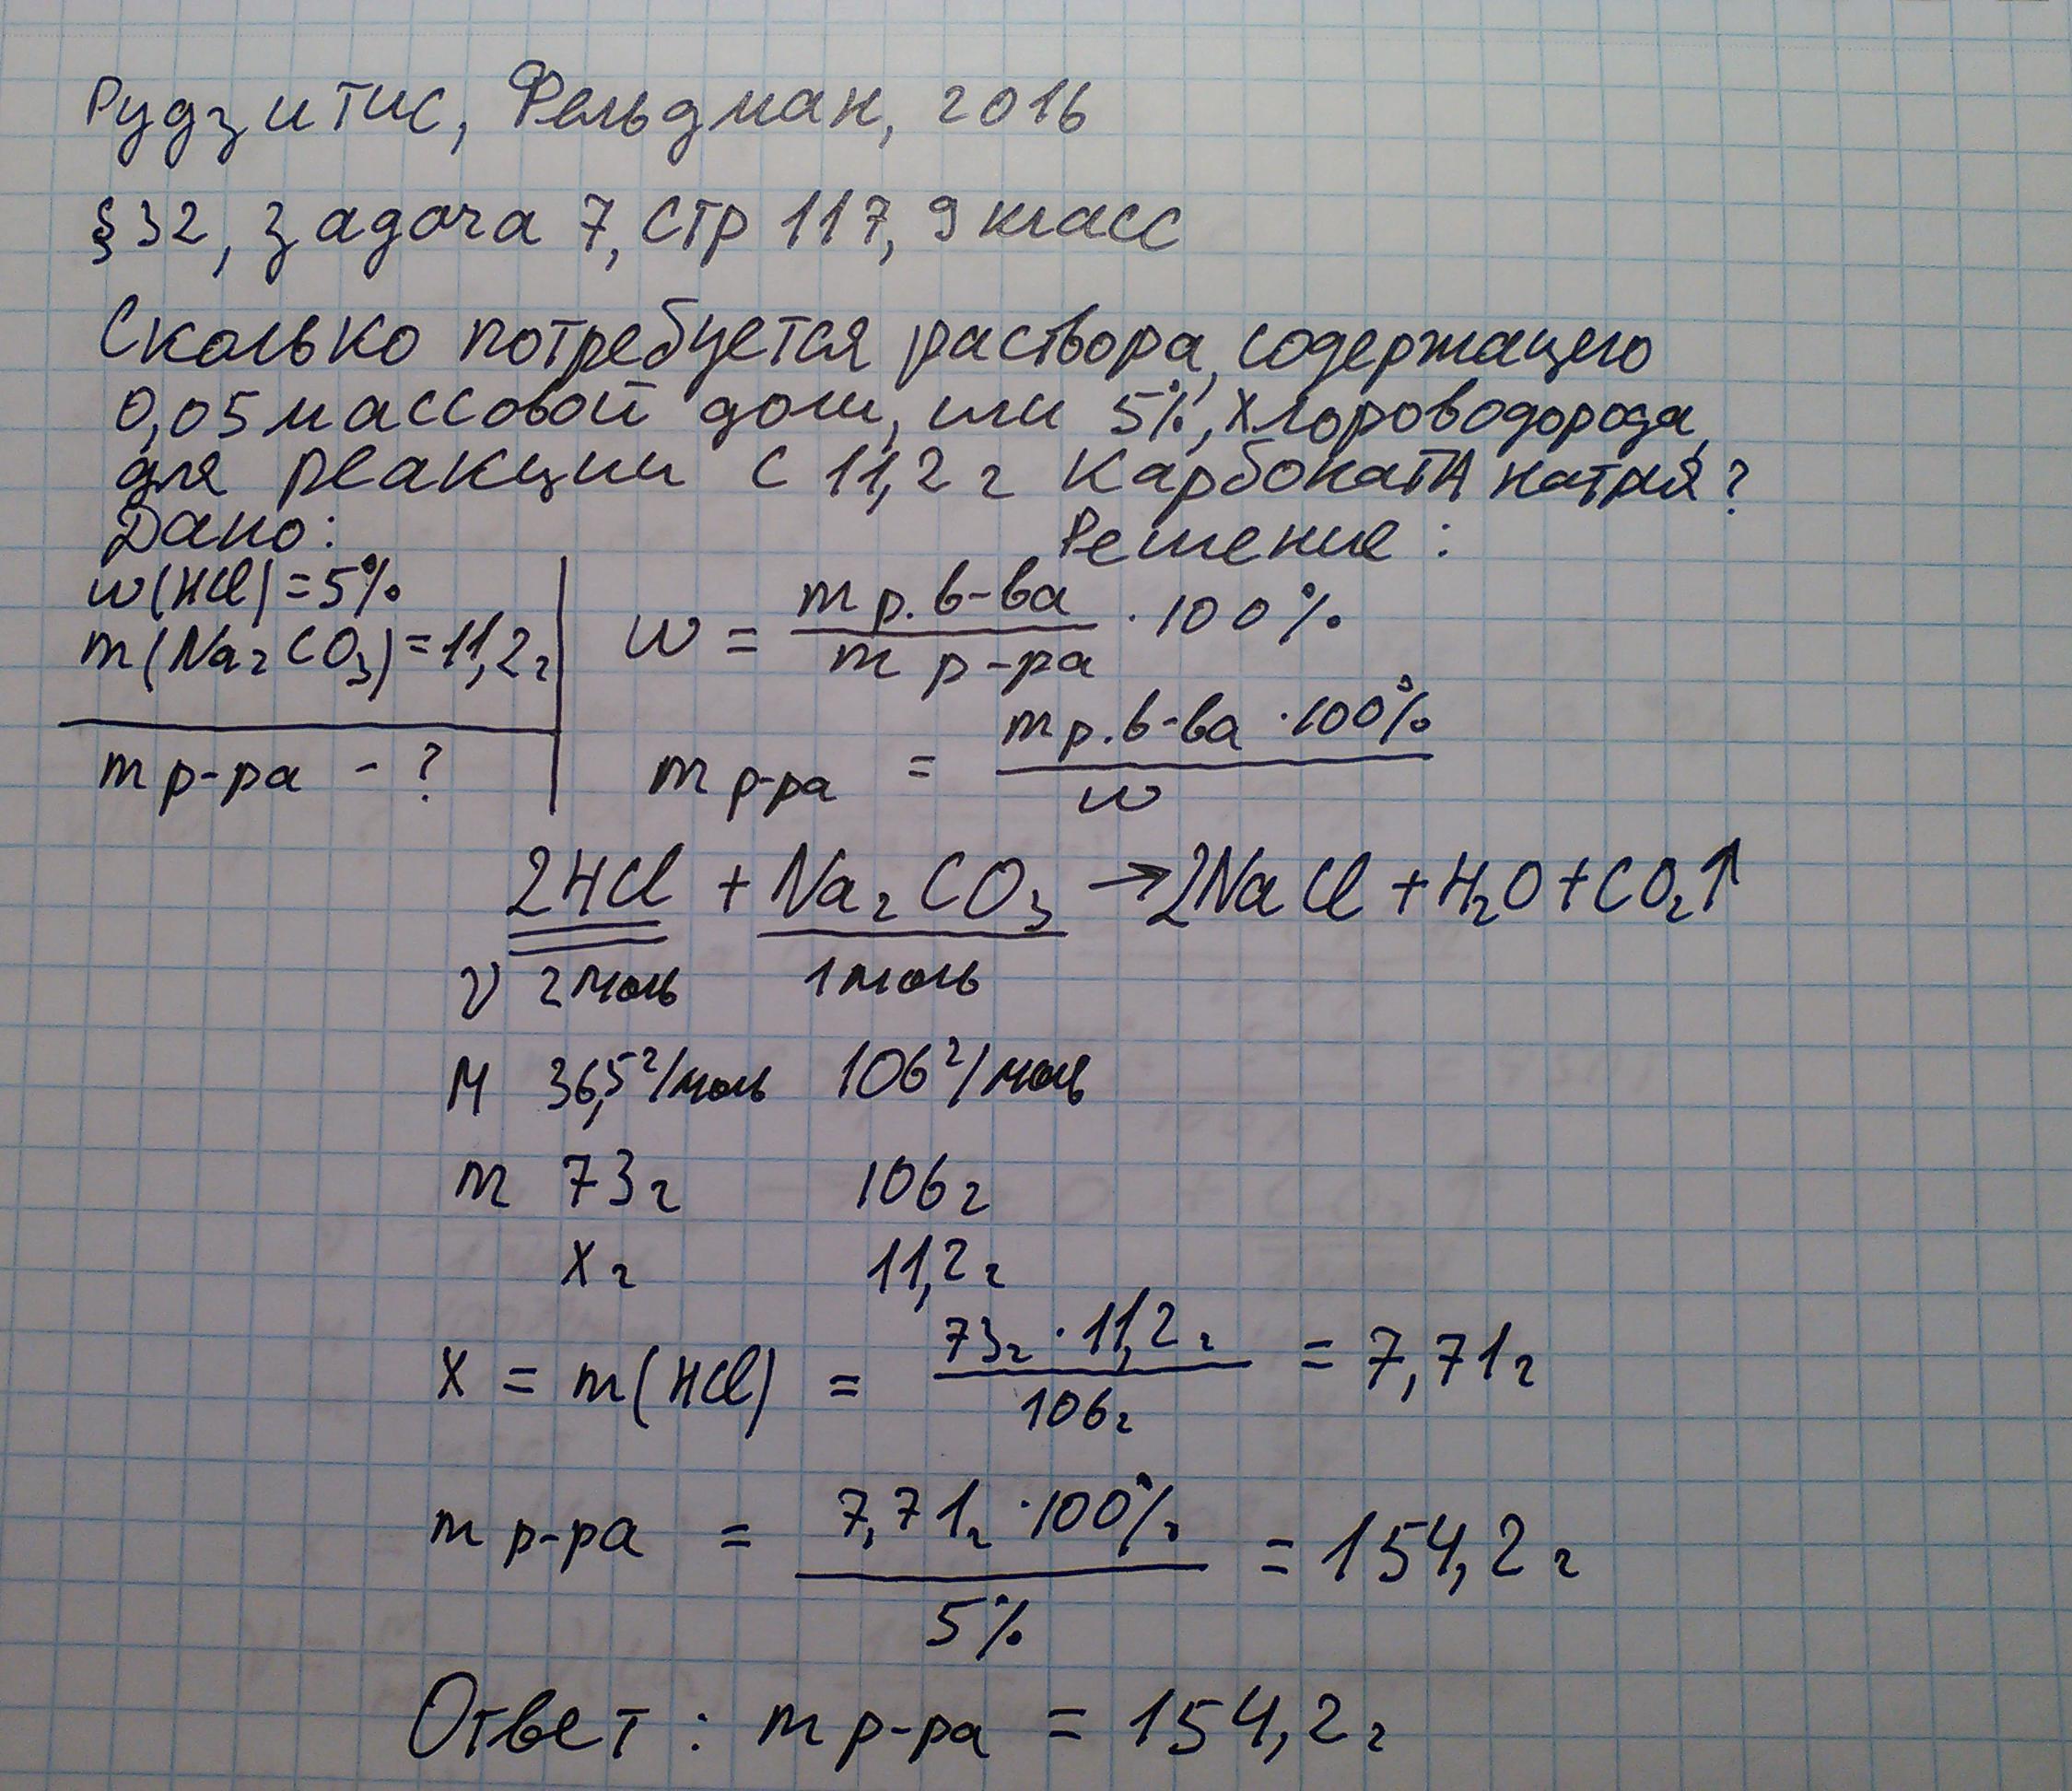 Решение задач в 7 классе по химии кто решит задачу в делфи